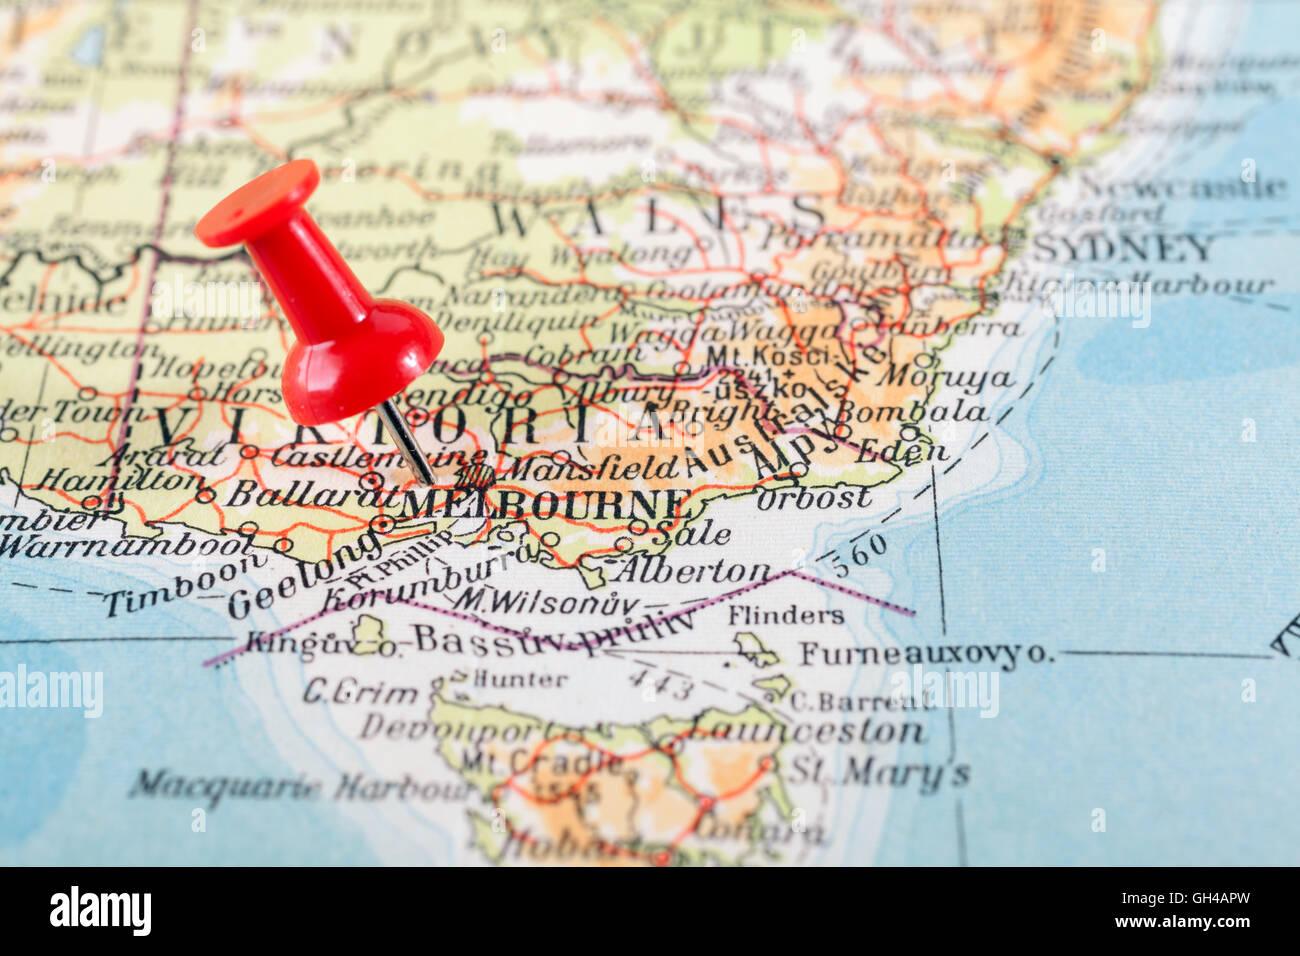 map pin maps pins stock photos map pin maps pins stock images